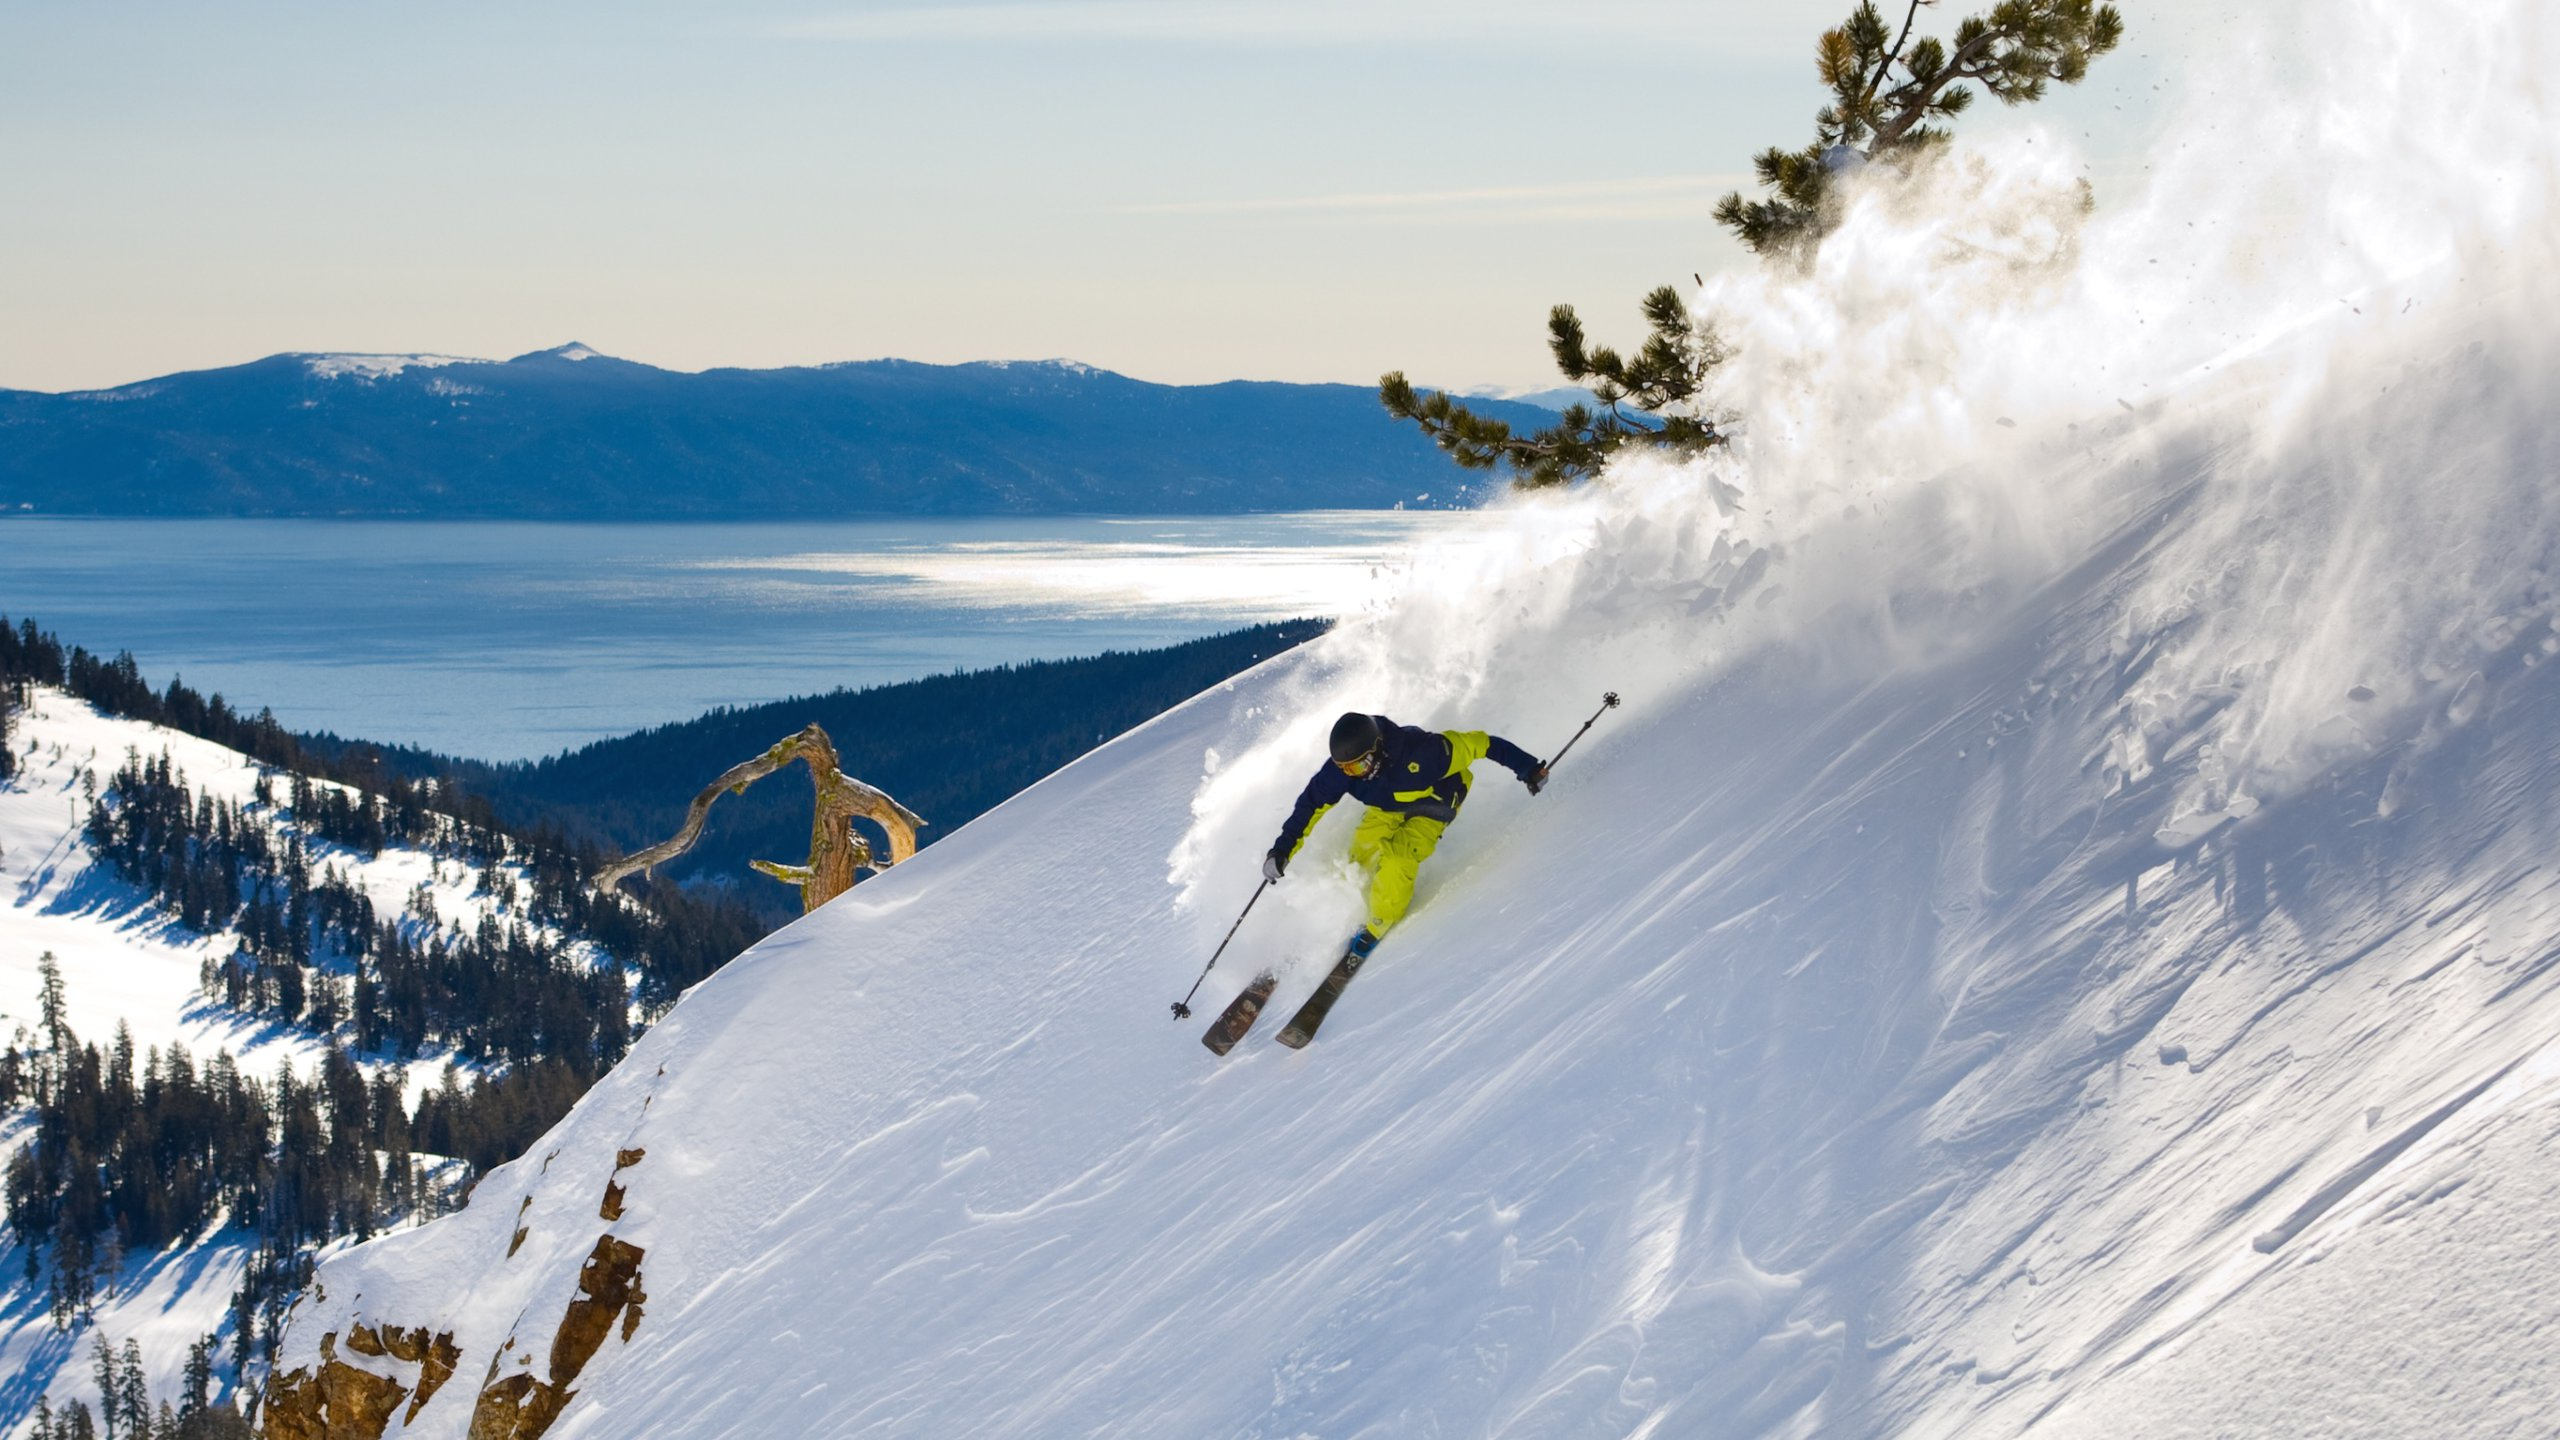 Alpine Meadows Ski Resort, California, United States of America